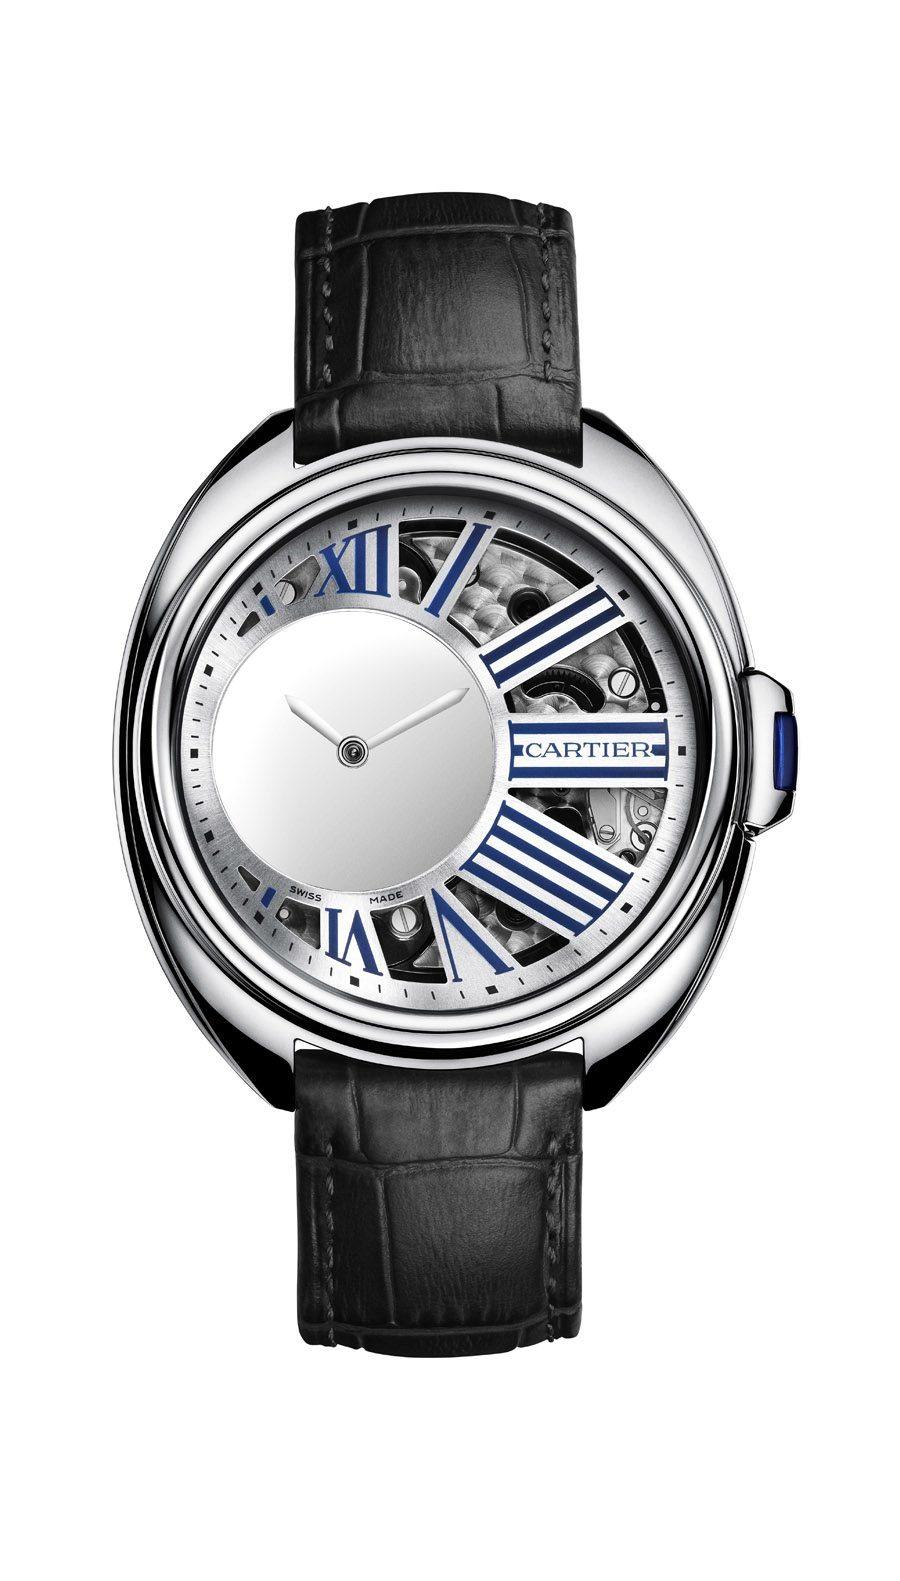 Cartier: Clé de Cartier Mysterious Hour in Palladium